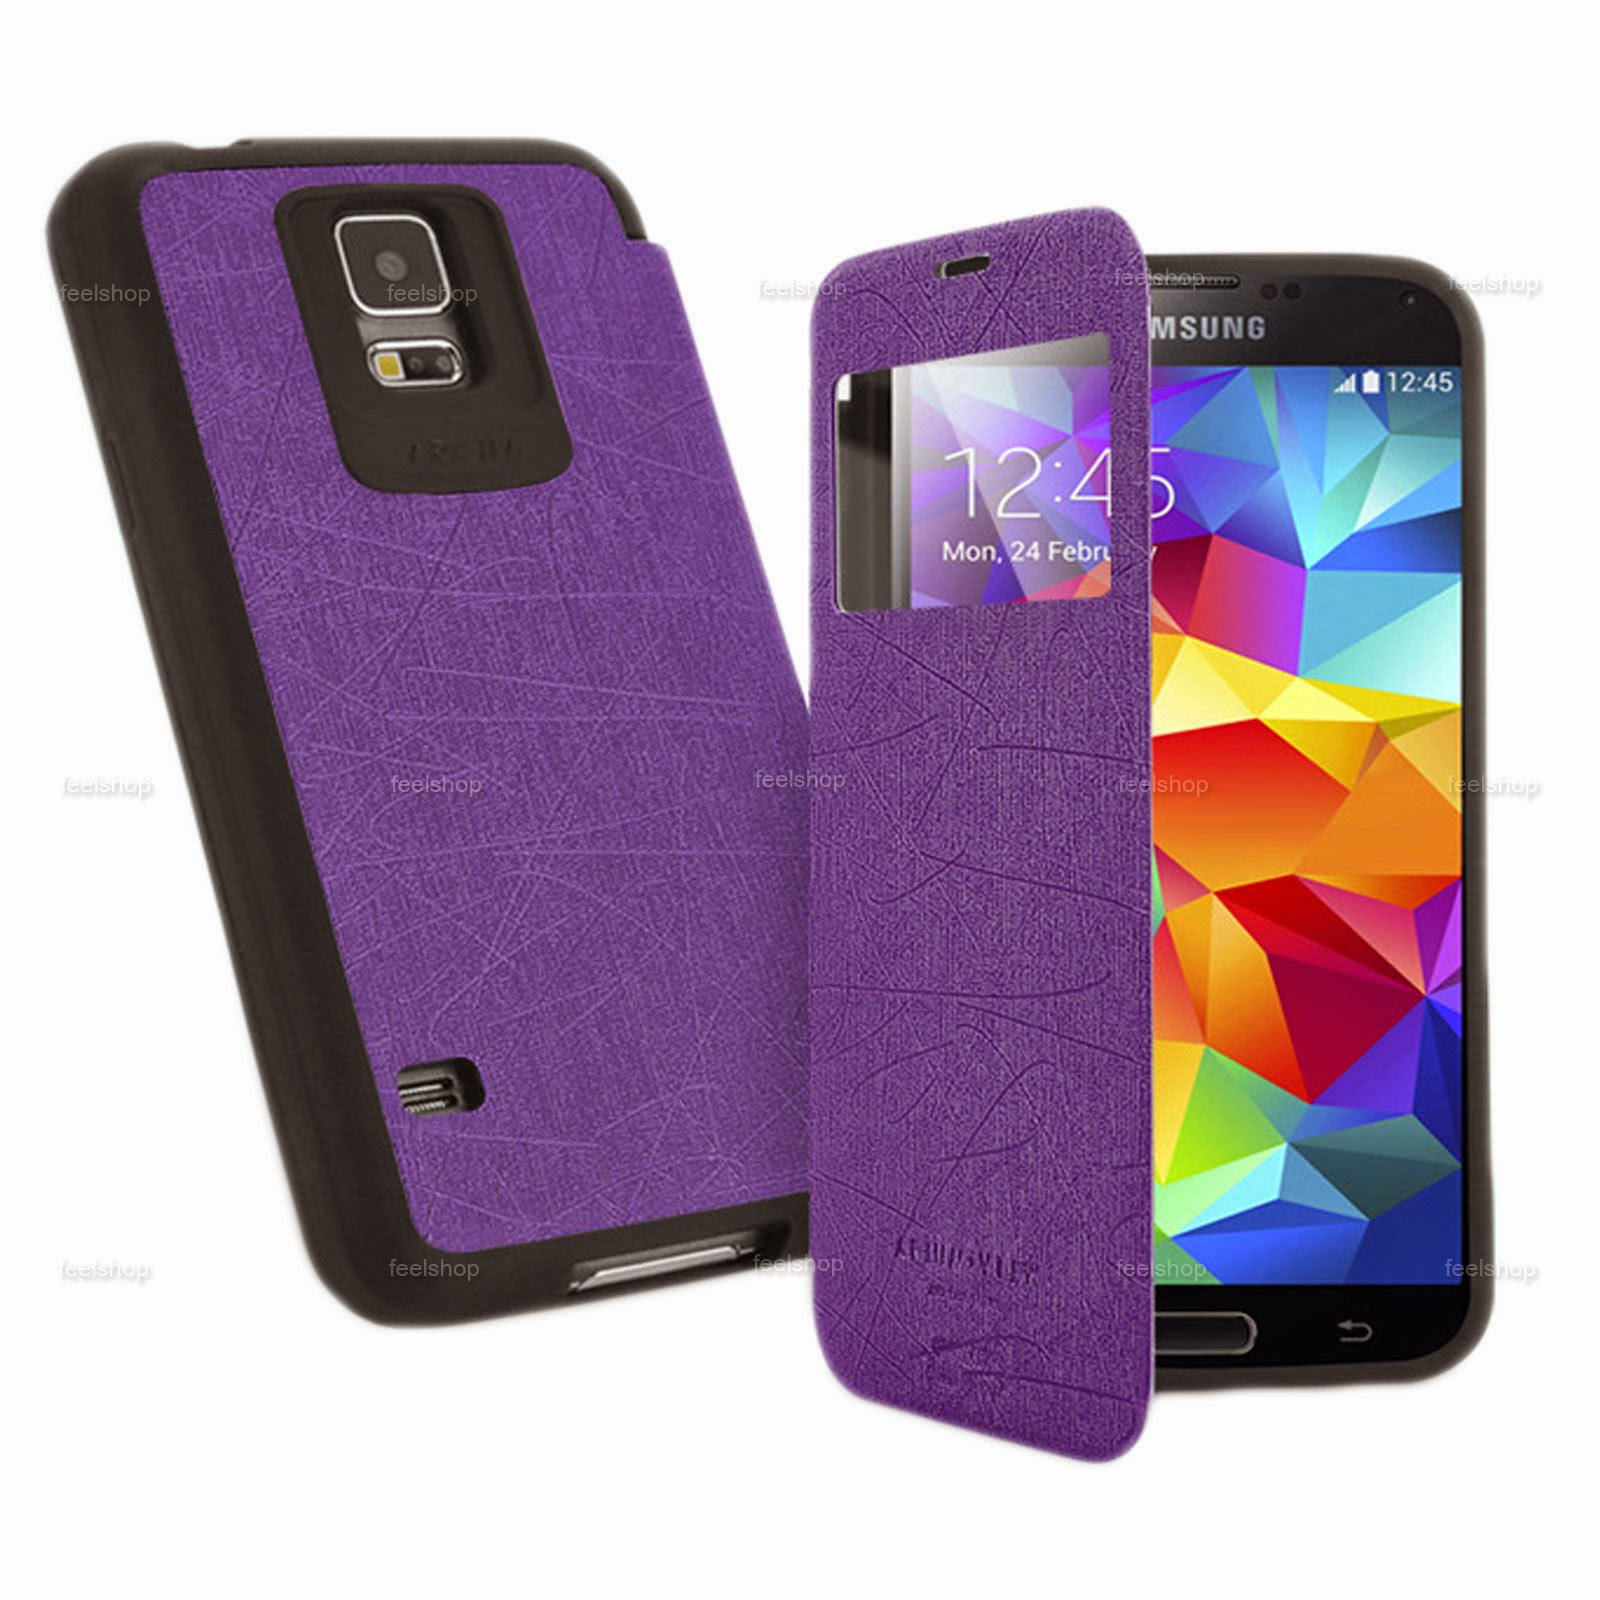 Arium Bumper View Shockproof Leather Flip Case For Samsung Galaxy Various Phones